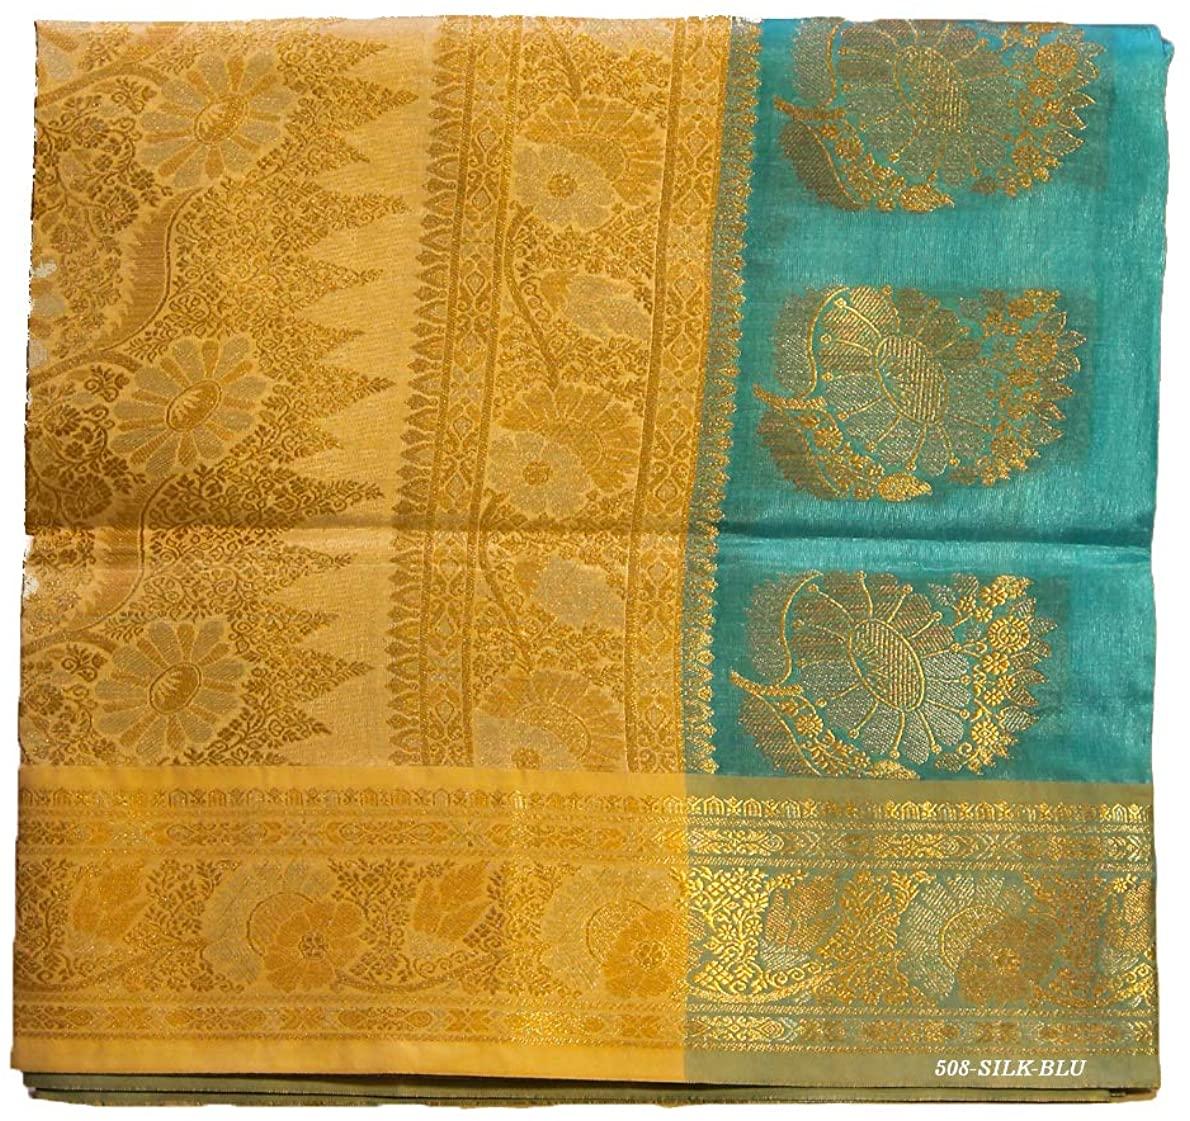 Pure Silk Saree for Women Kanchipuram Kanjivaram Pattu Sari Handloom Banarasi Silk Tussar Silk Mysore Silk Blue